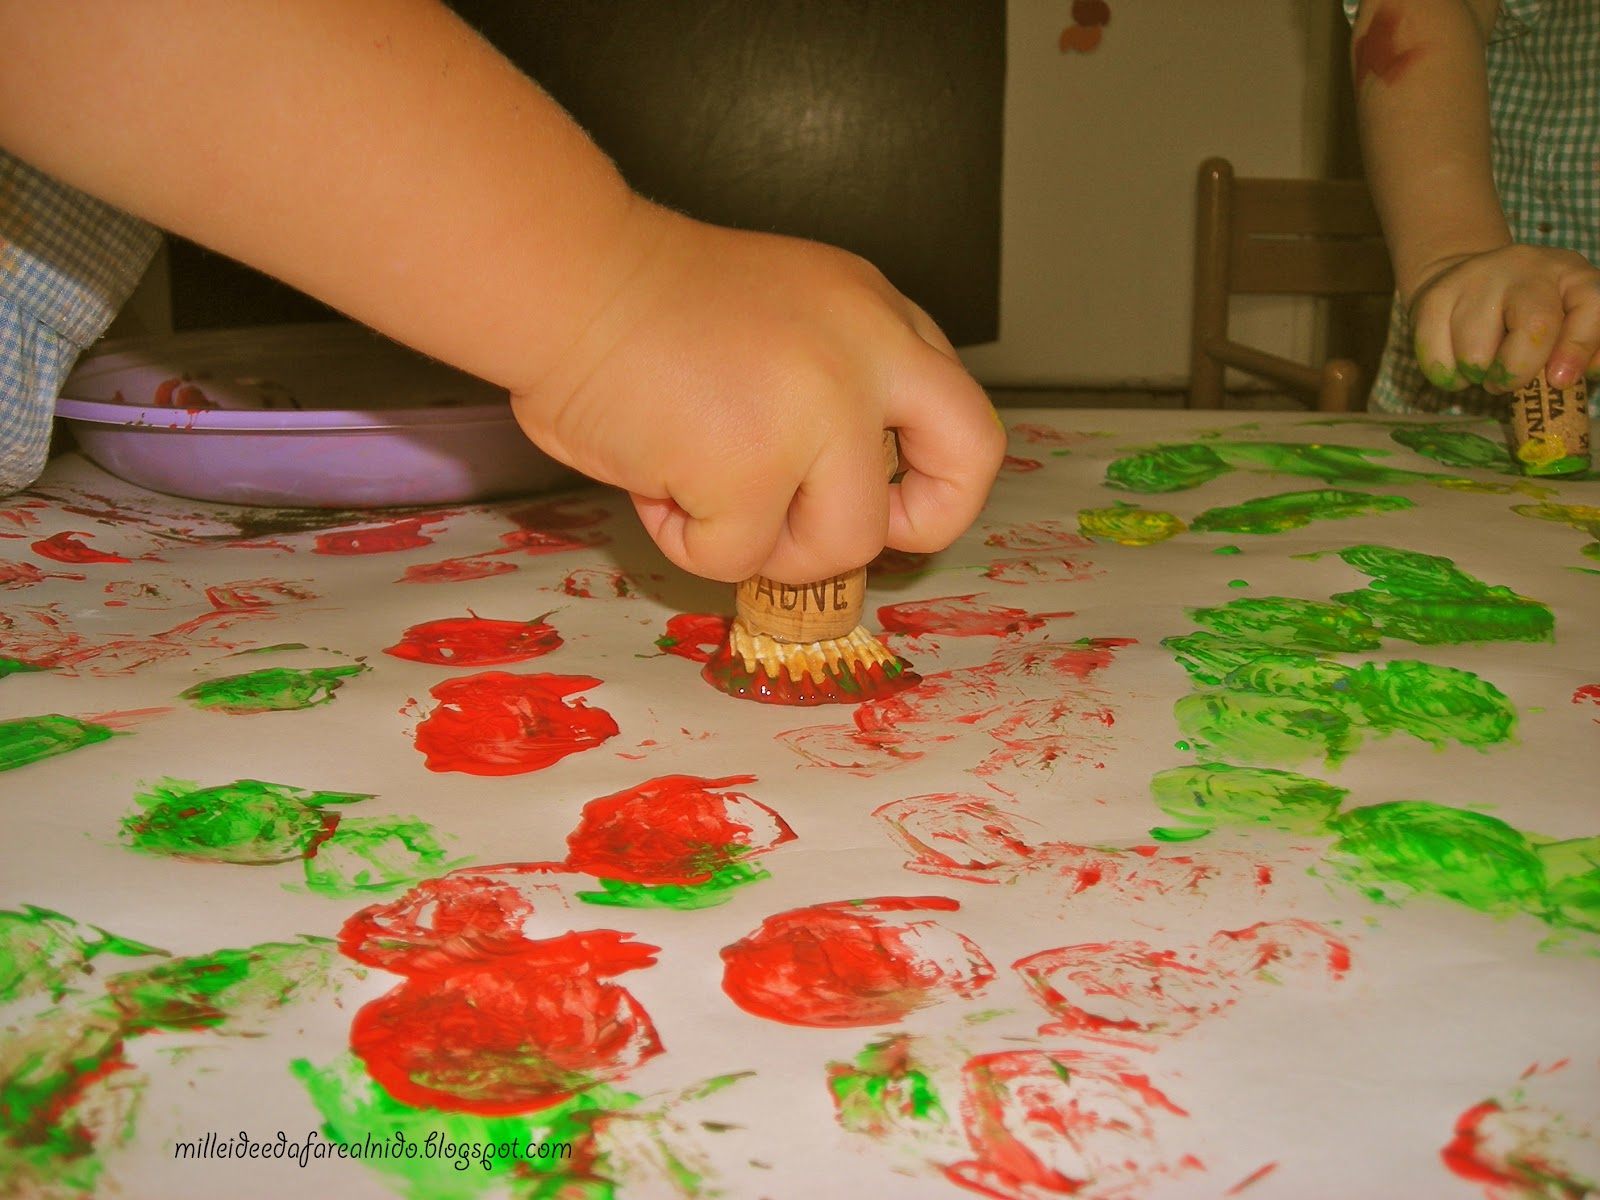 Amato Mille idee al nido: febbraio 2012 LJ63